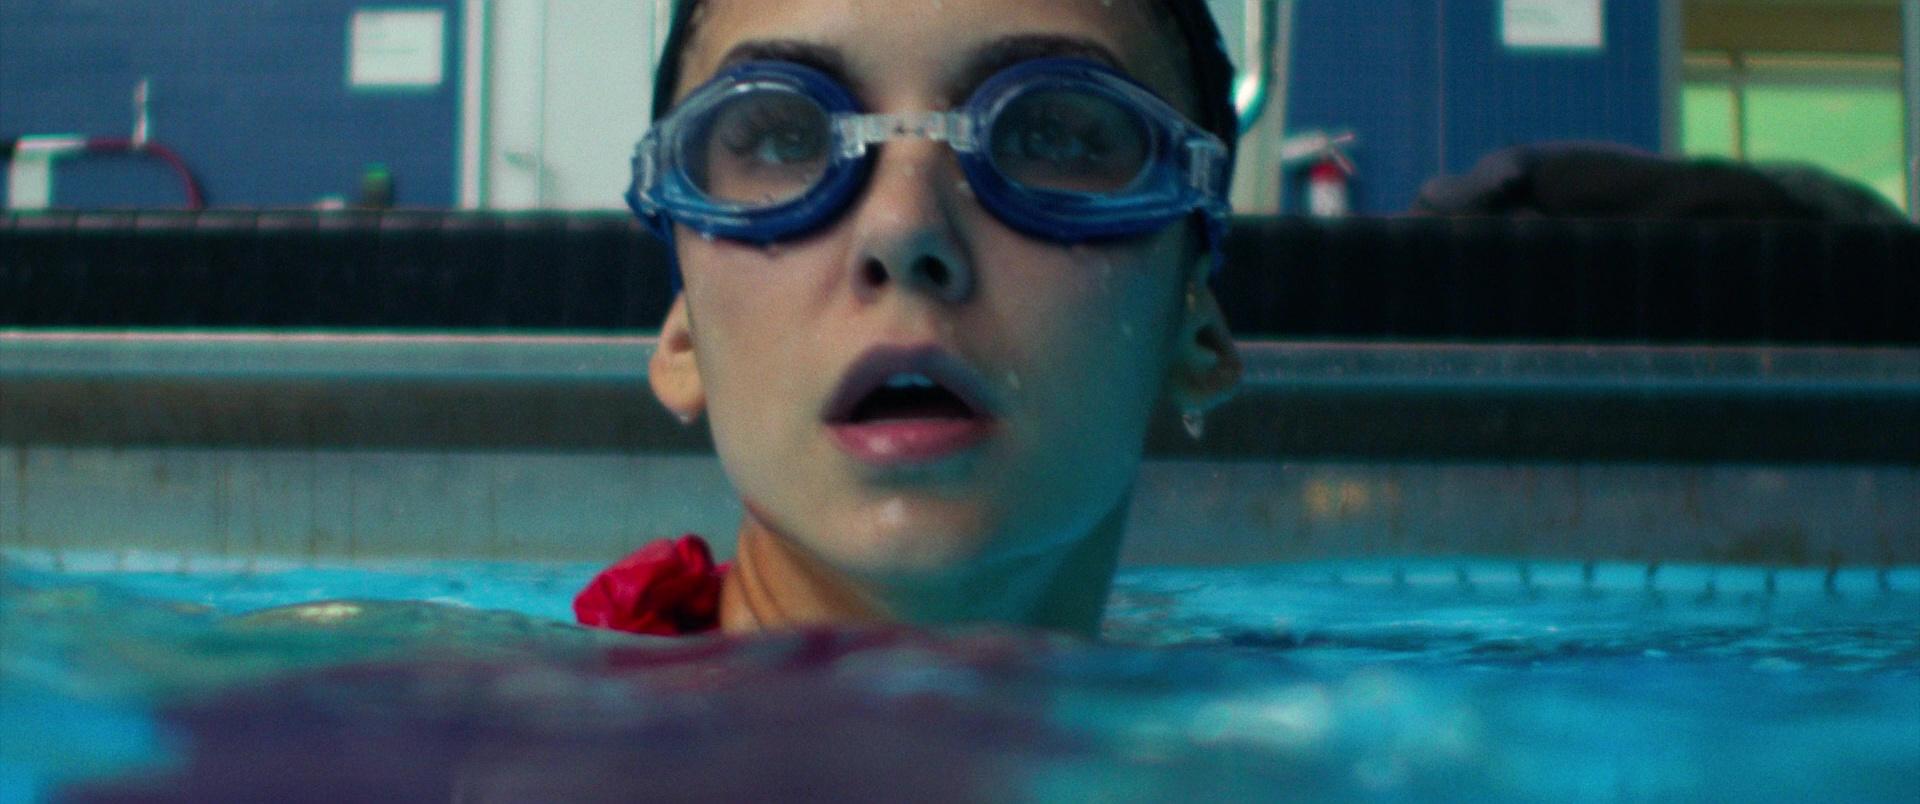 Leader Swimming Goggles And Swim Cap Worn By Nina Dobrev